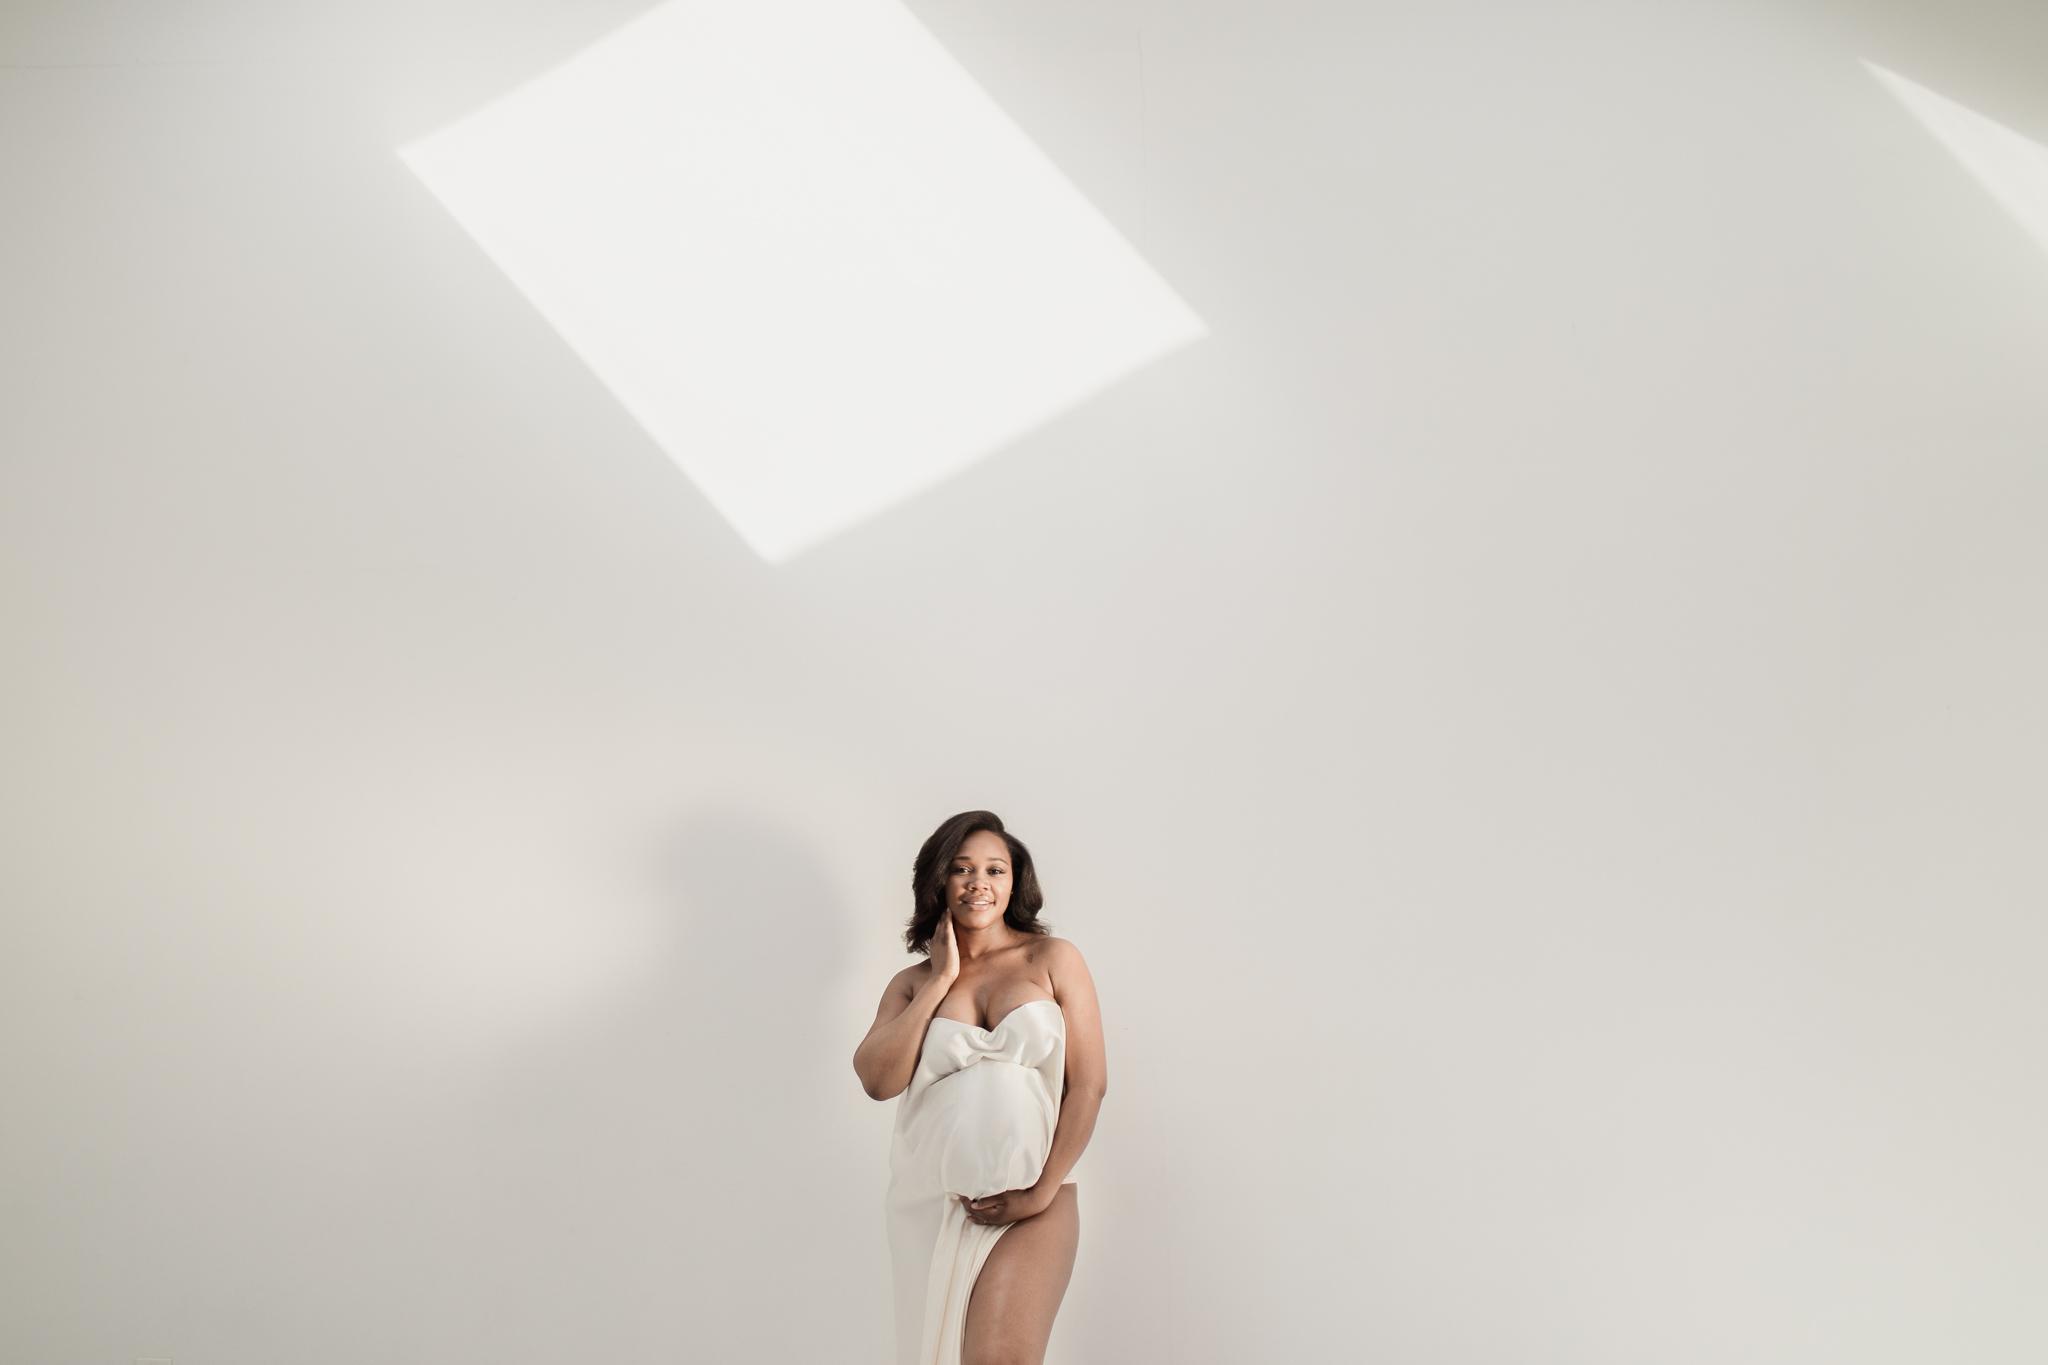 maternity-photographer-dallas-dfw-018.jpg